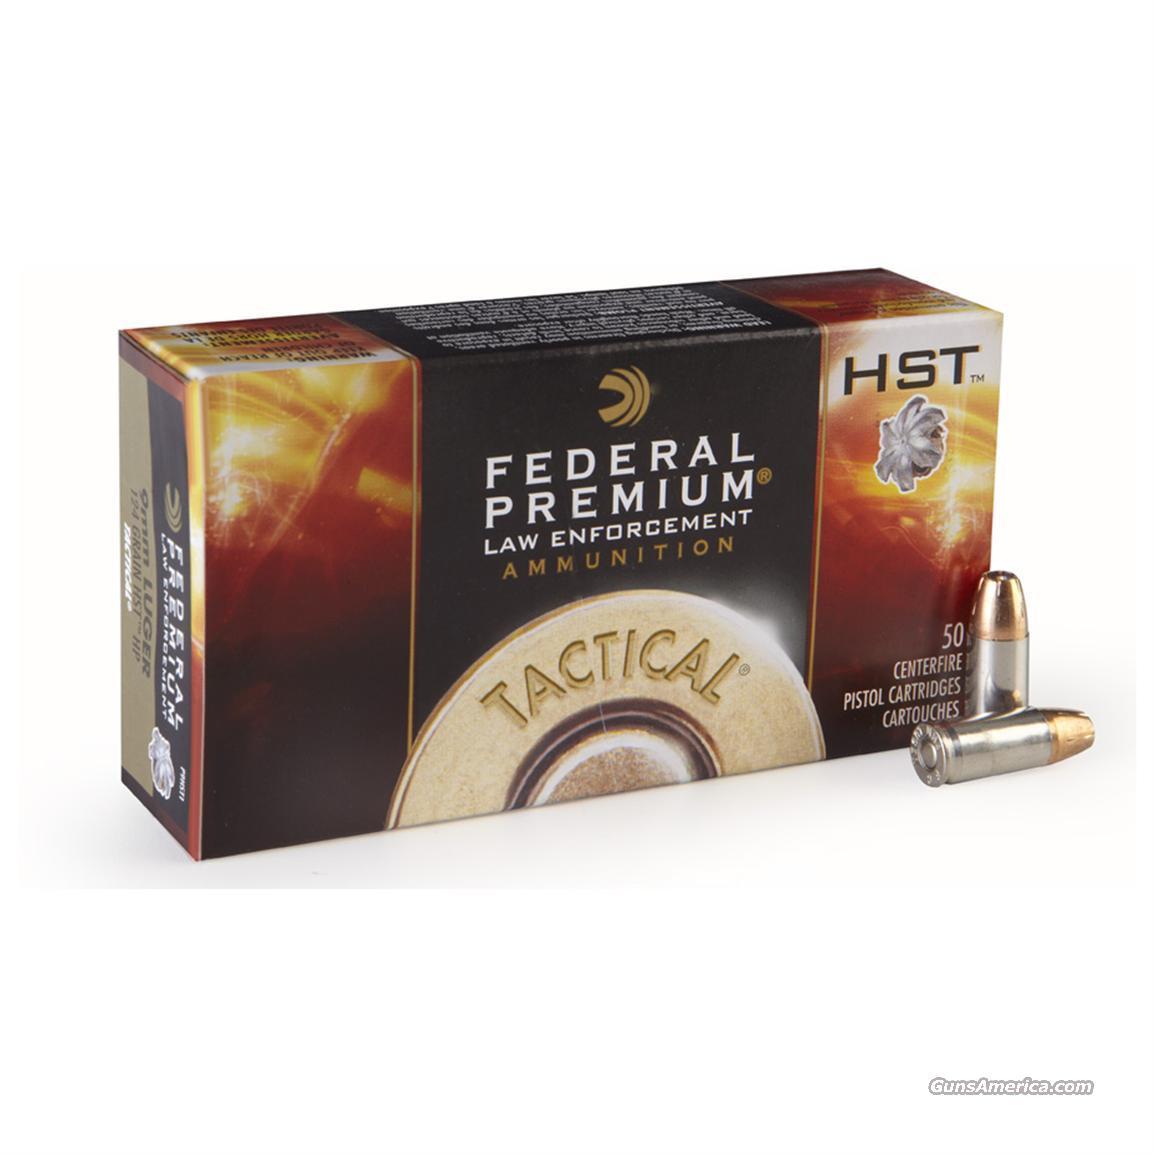 Federal Tactical HST 9mm 124gr +P P9HST3 Ammo Ammunition outperforms Speer  Gold Dots GDHP 124 grain